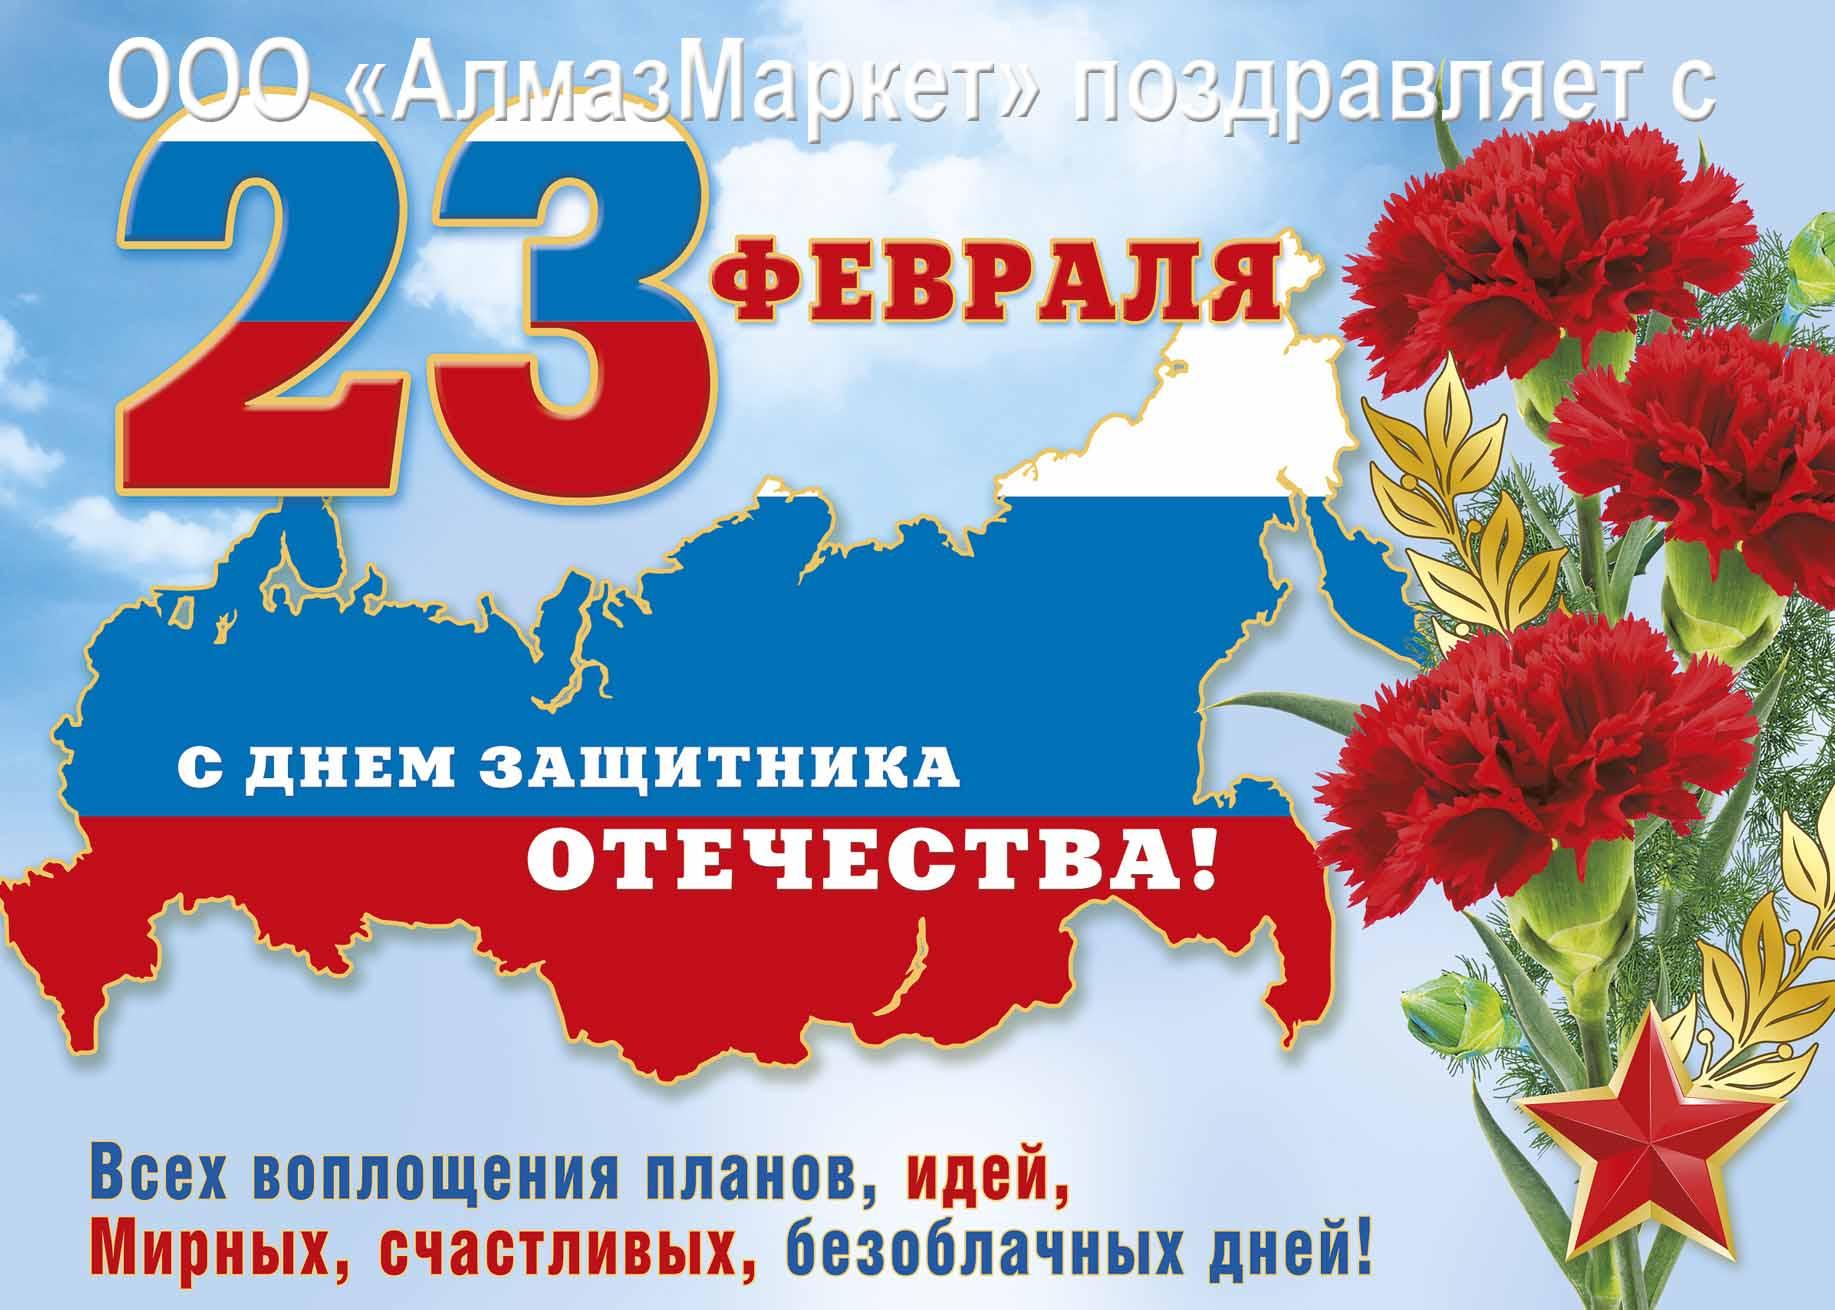 ООО «АлмазМаркет» поздравляет с Днем Защитника Отечества!!!